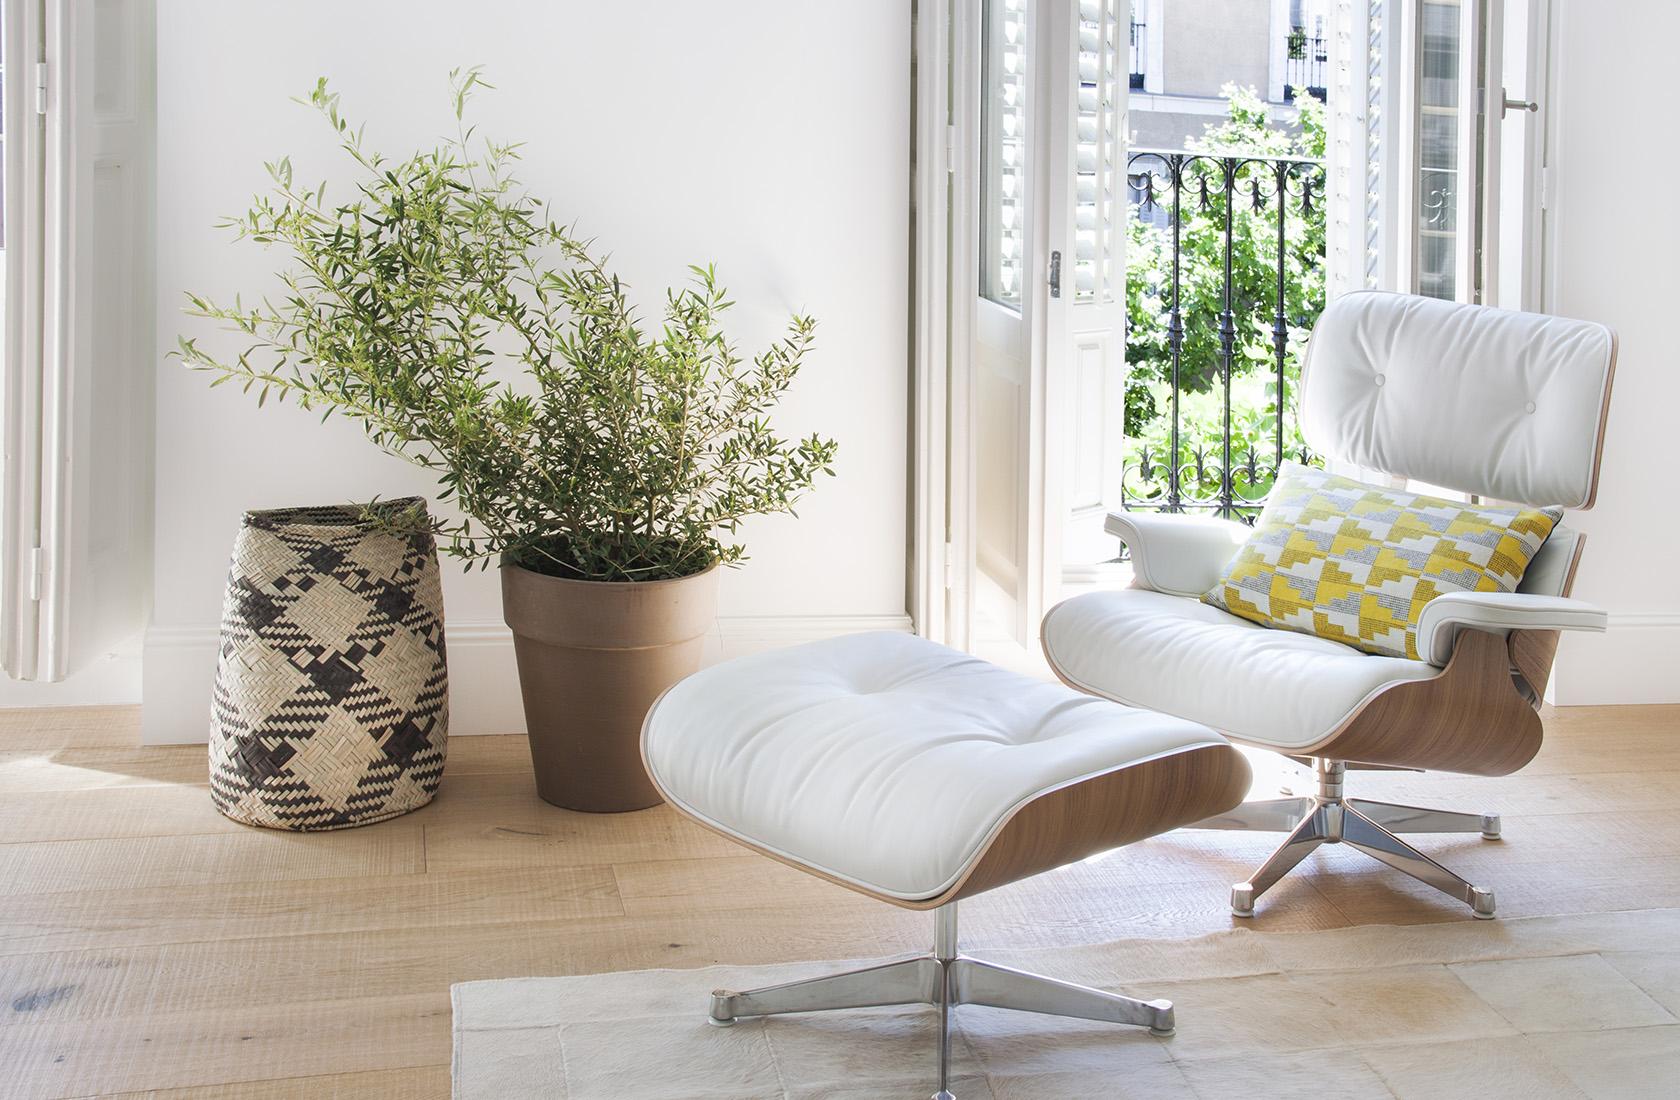 reforma-casa-ayala-eames-lounge-chair